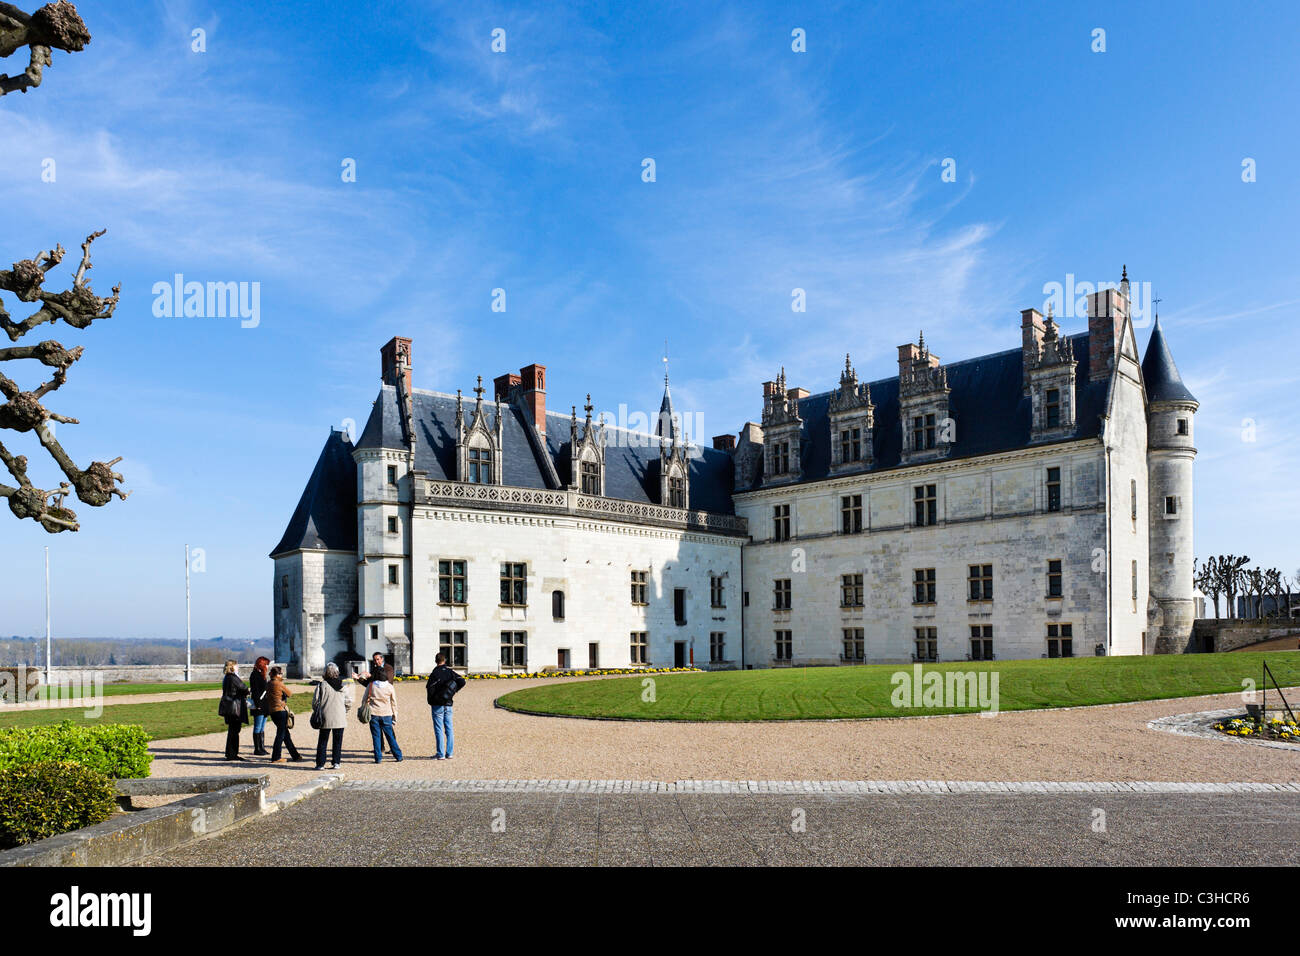 Chateau d'Amboise, Loire Valley, Touraine, France - Stock Image